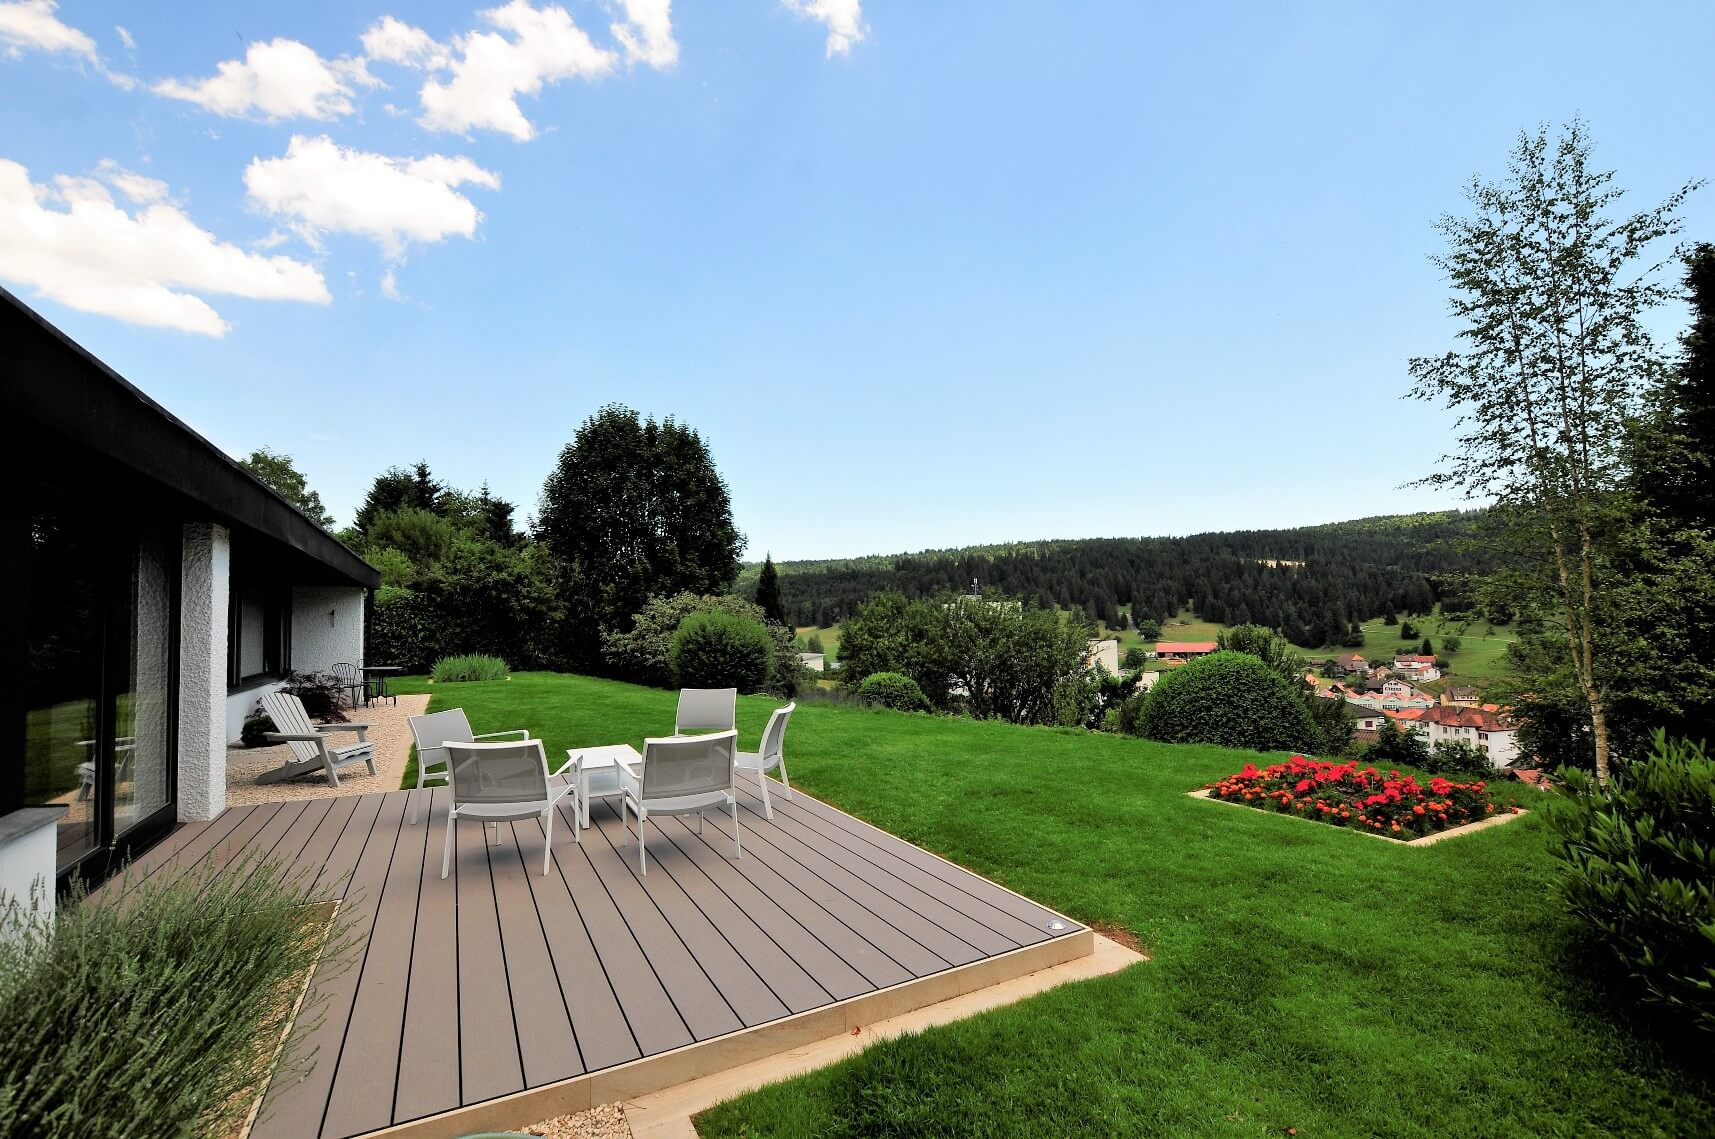 paysagiste tramelan villa terrasse jardin mur en pierres calcaires aellig paysages (4)